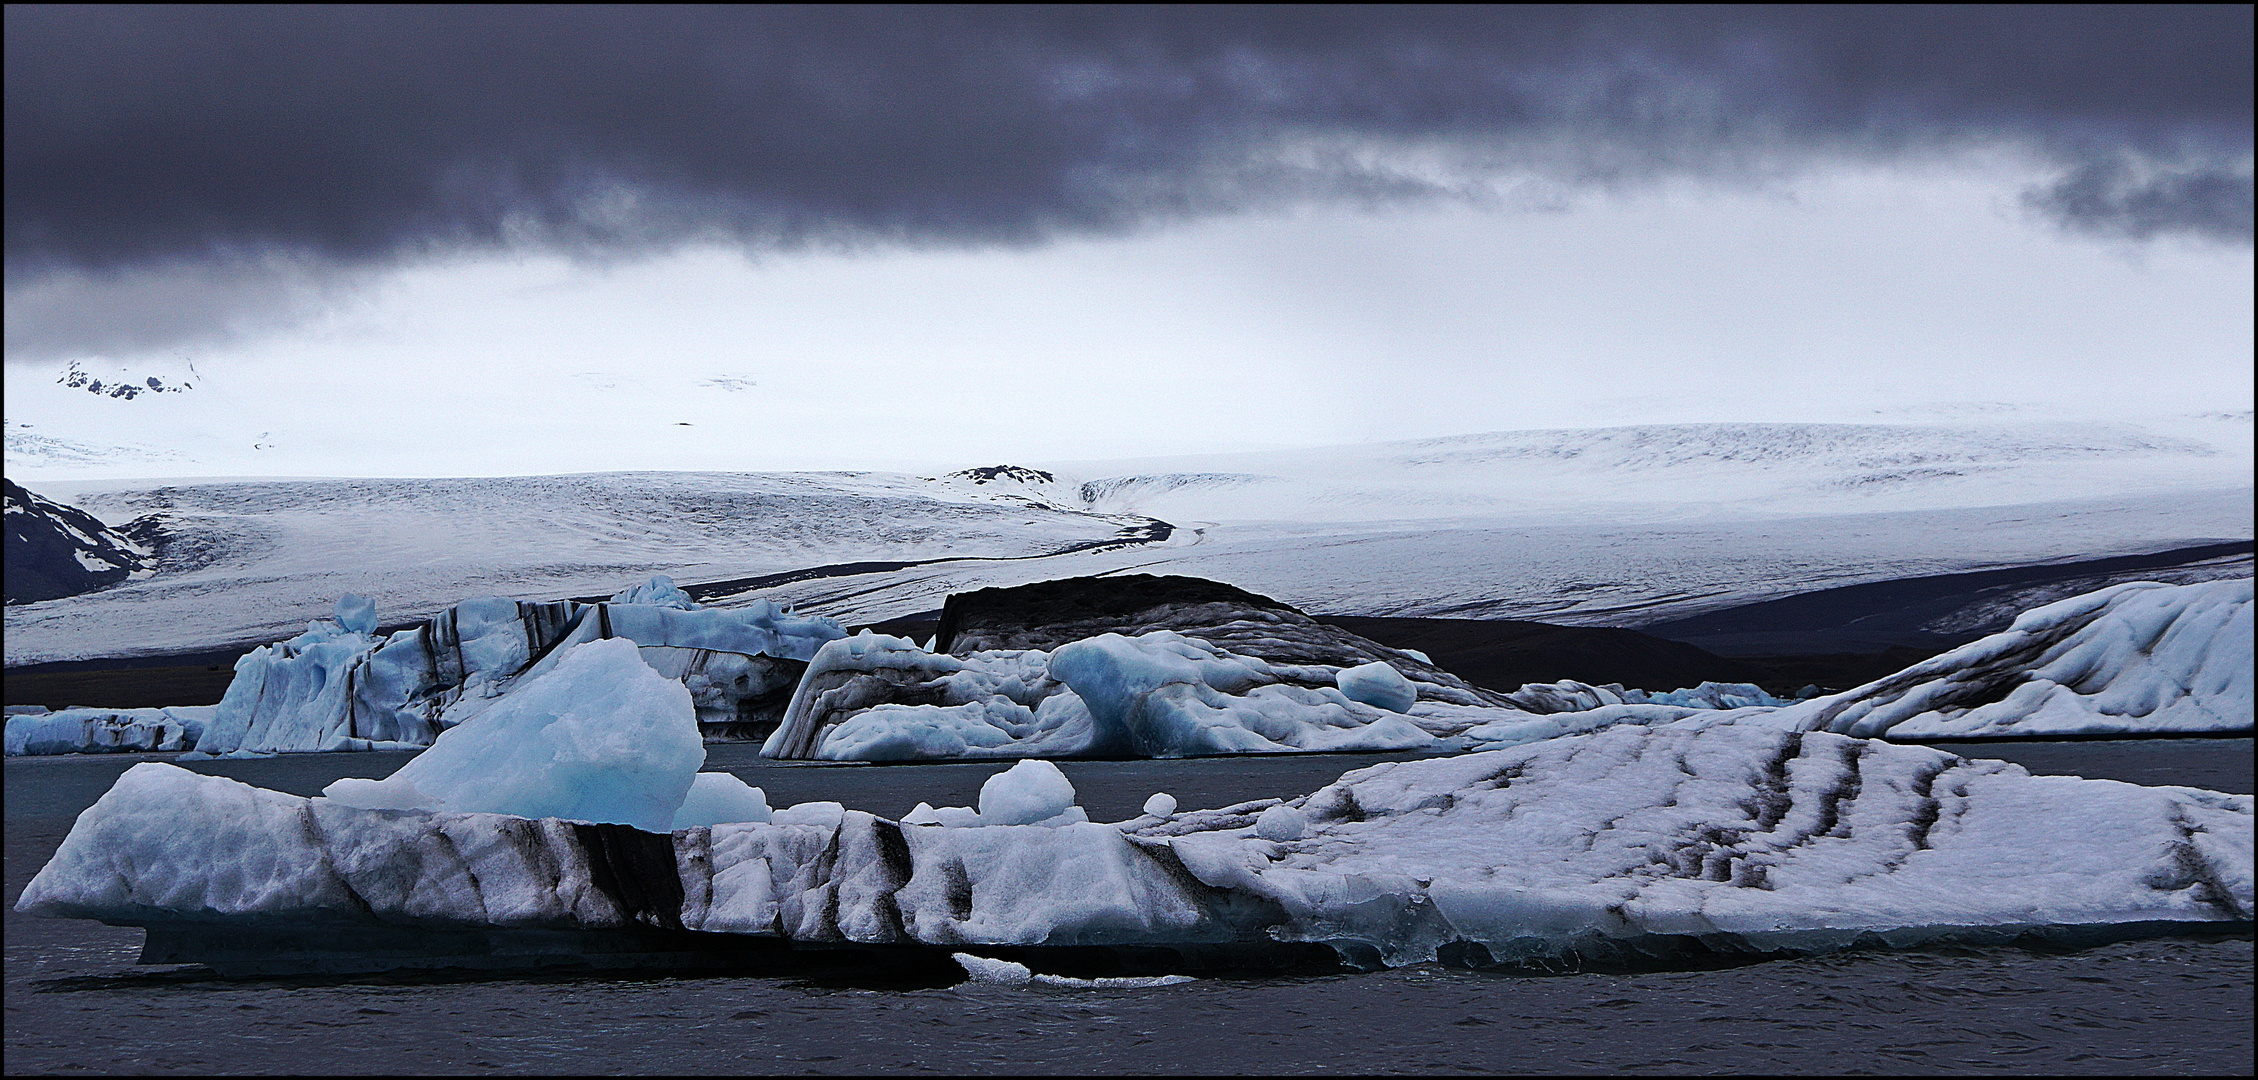 Gletscherlagune Jökulsarlon (Iceland)